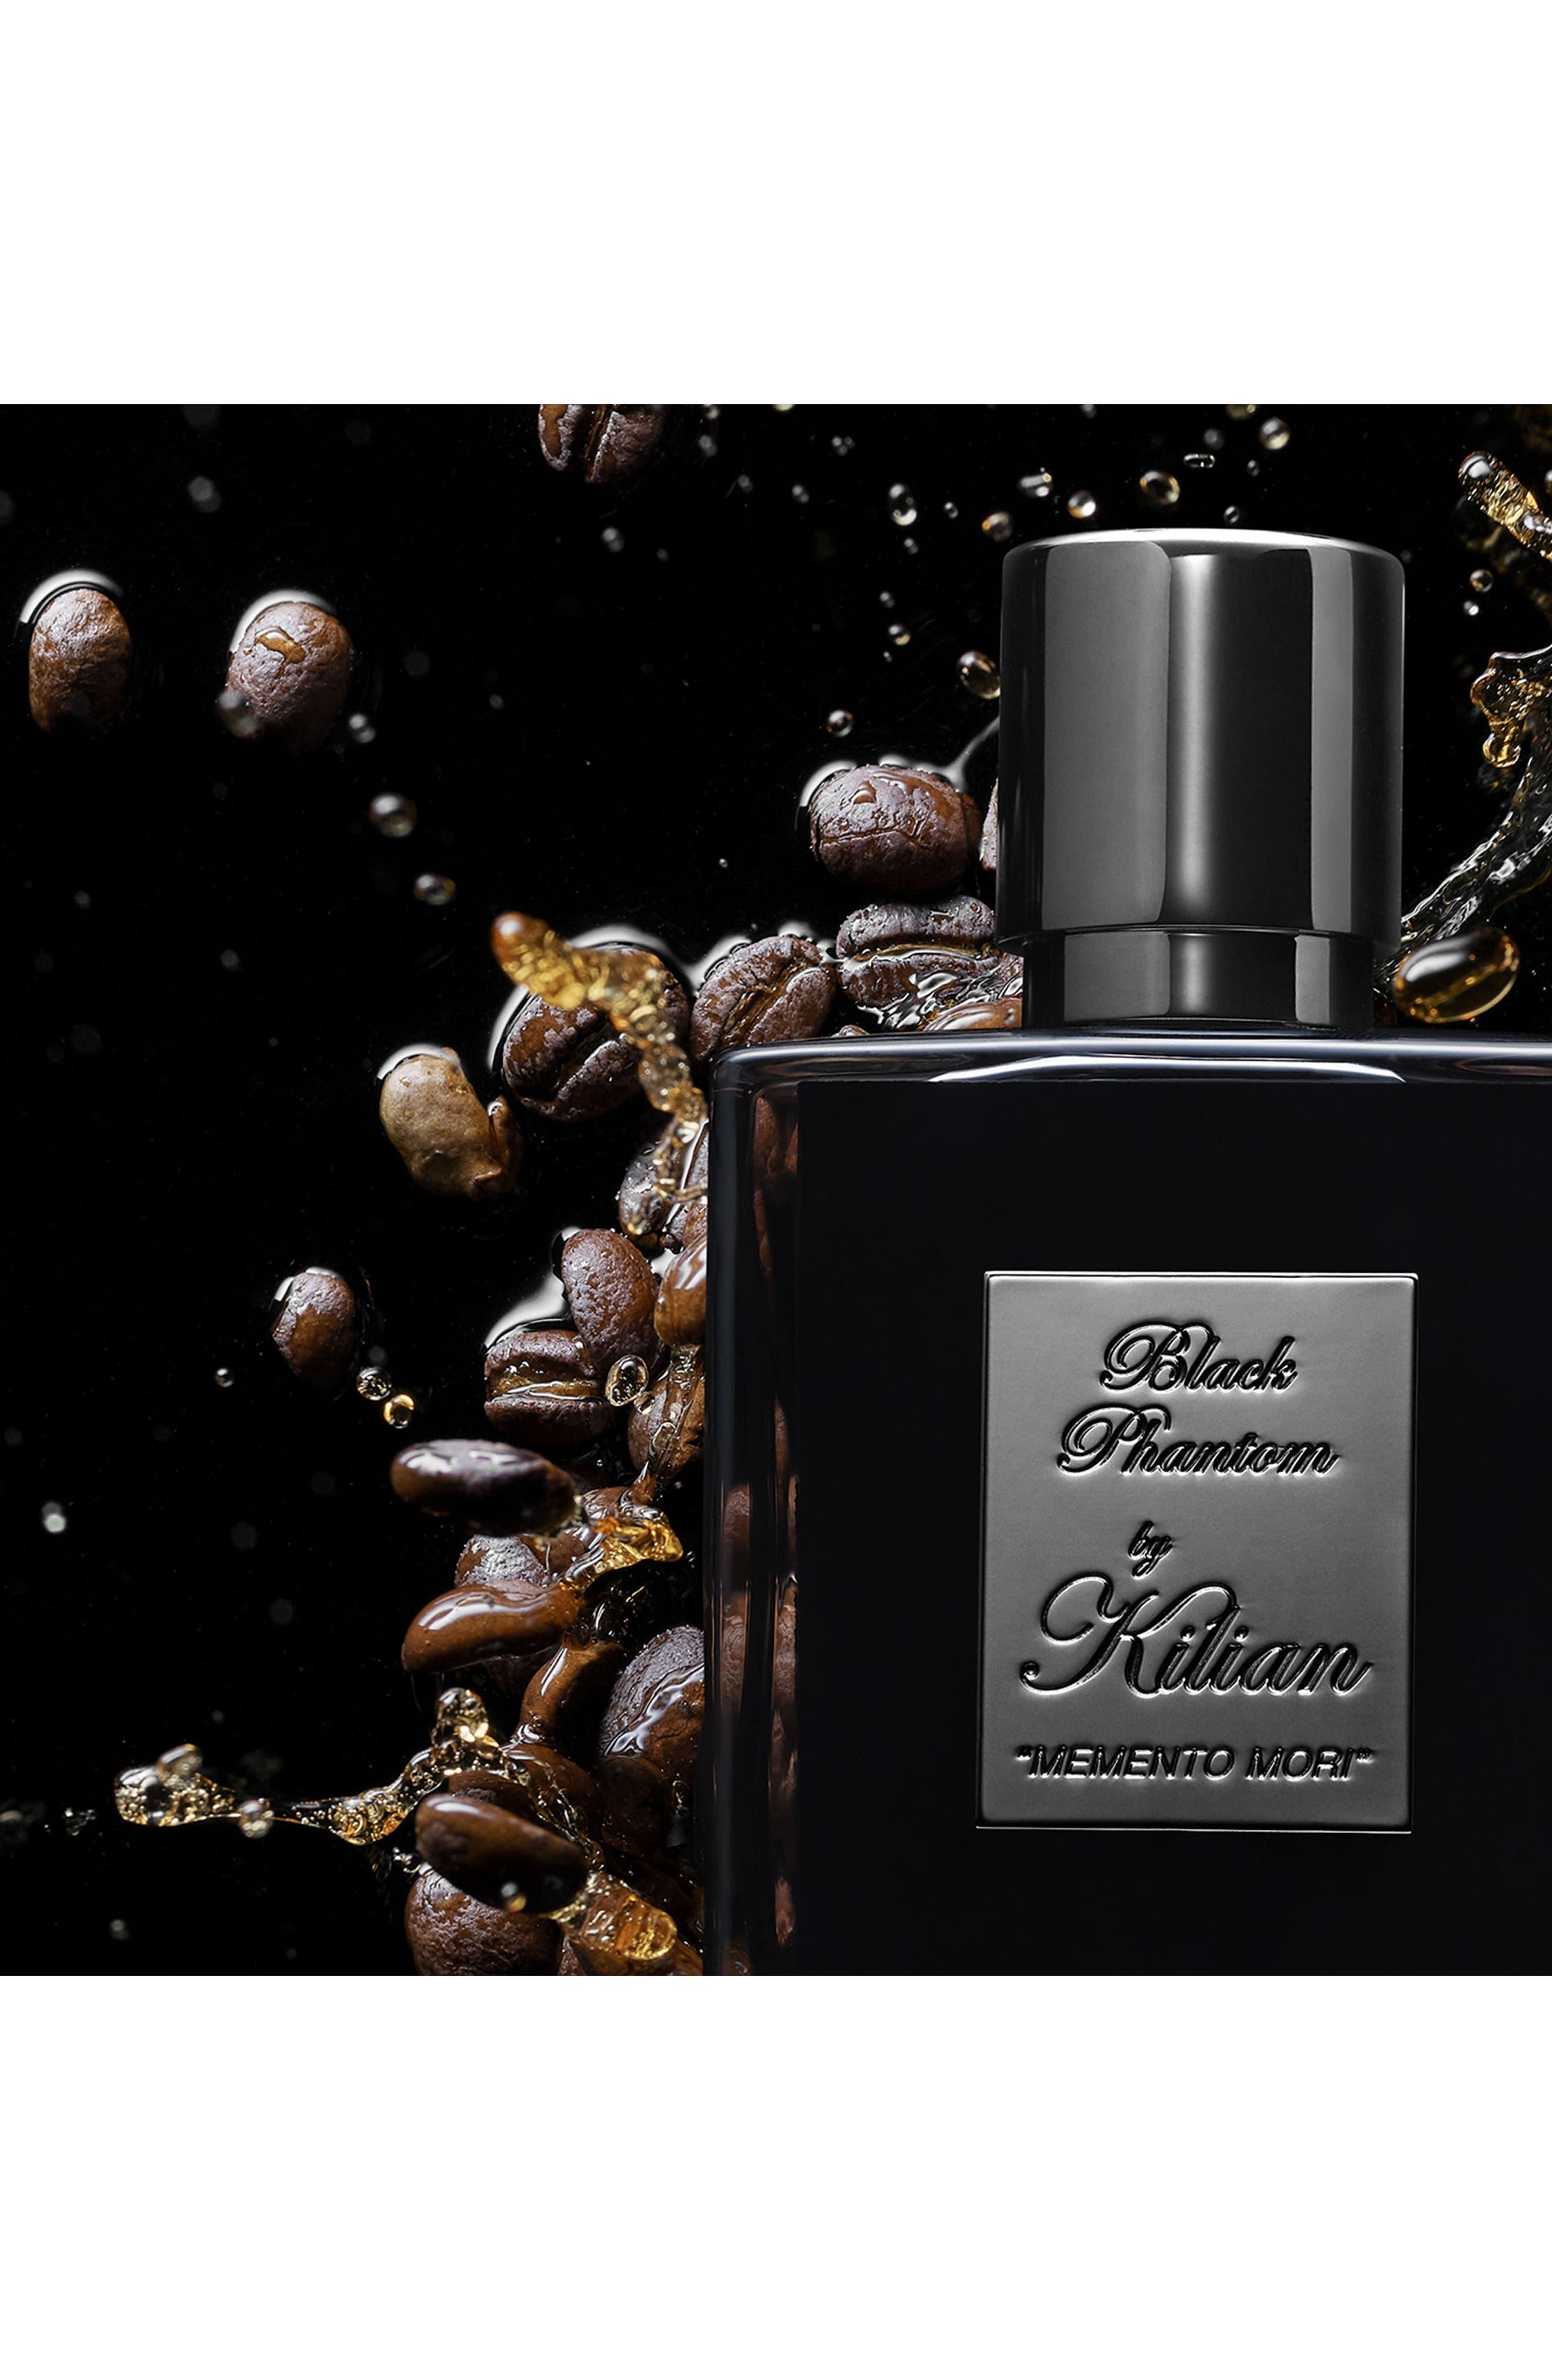 Black Phantom Memento Mori Eau de Parfum Travel Spray Set,                             Alternate thumbnail 2, color,